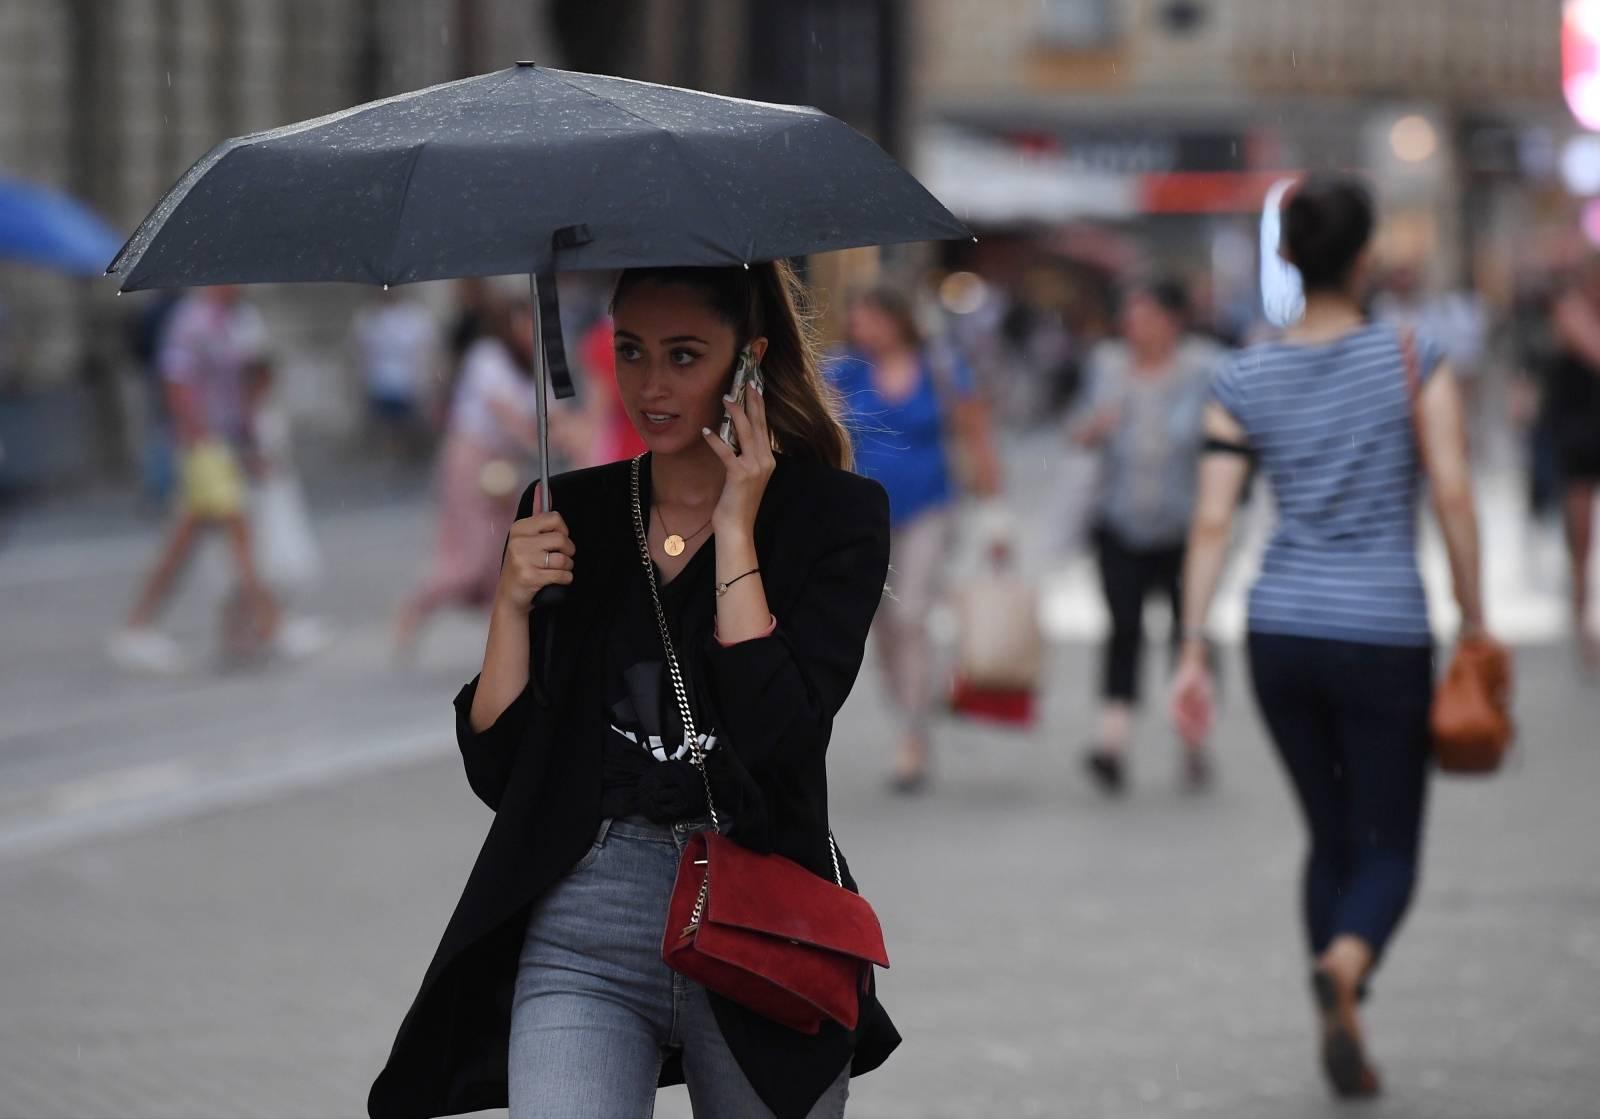 Zagreb: Kiša u večernjim satima osvježila grad